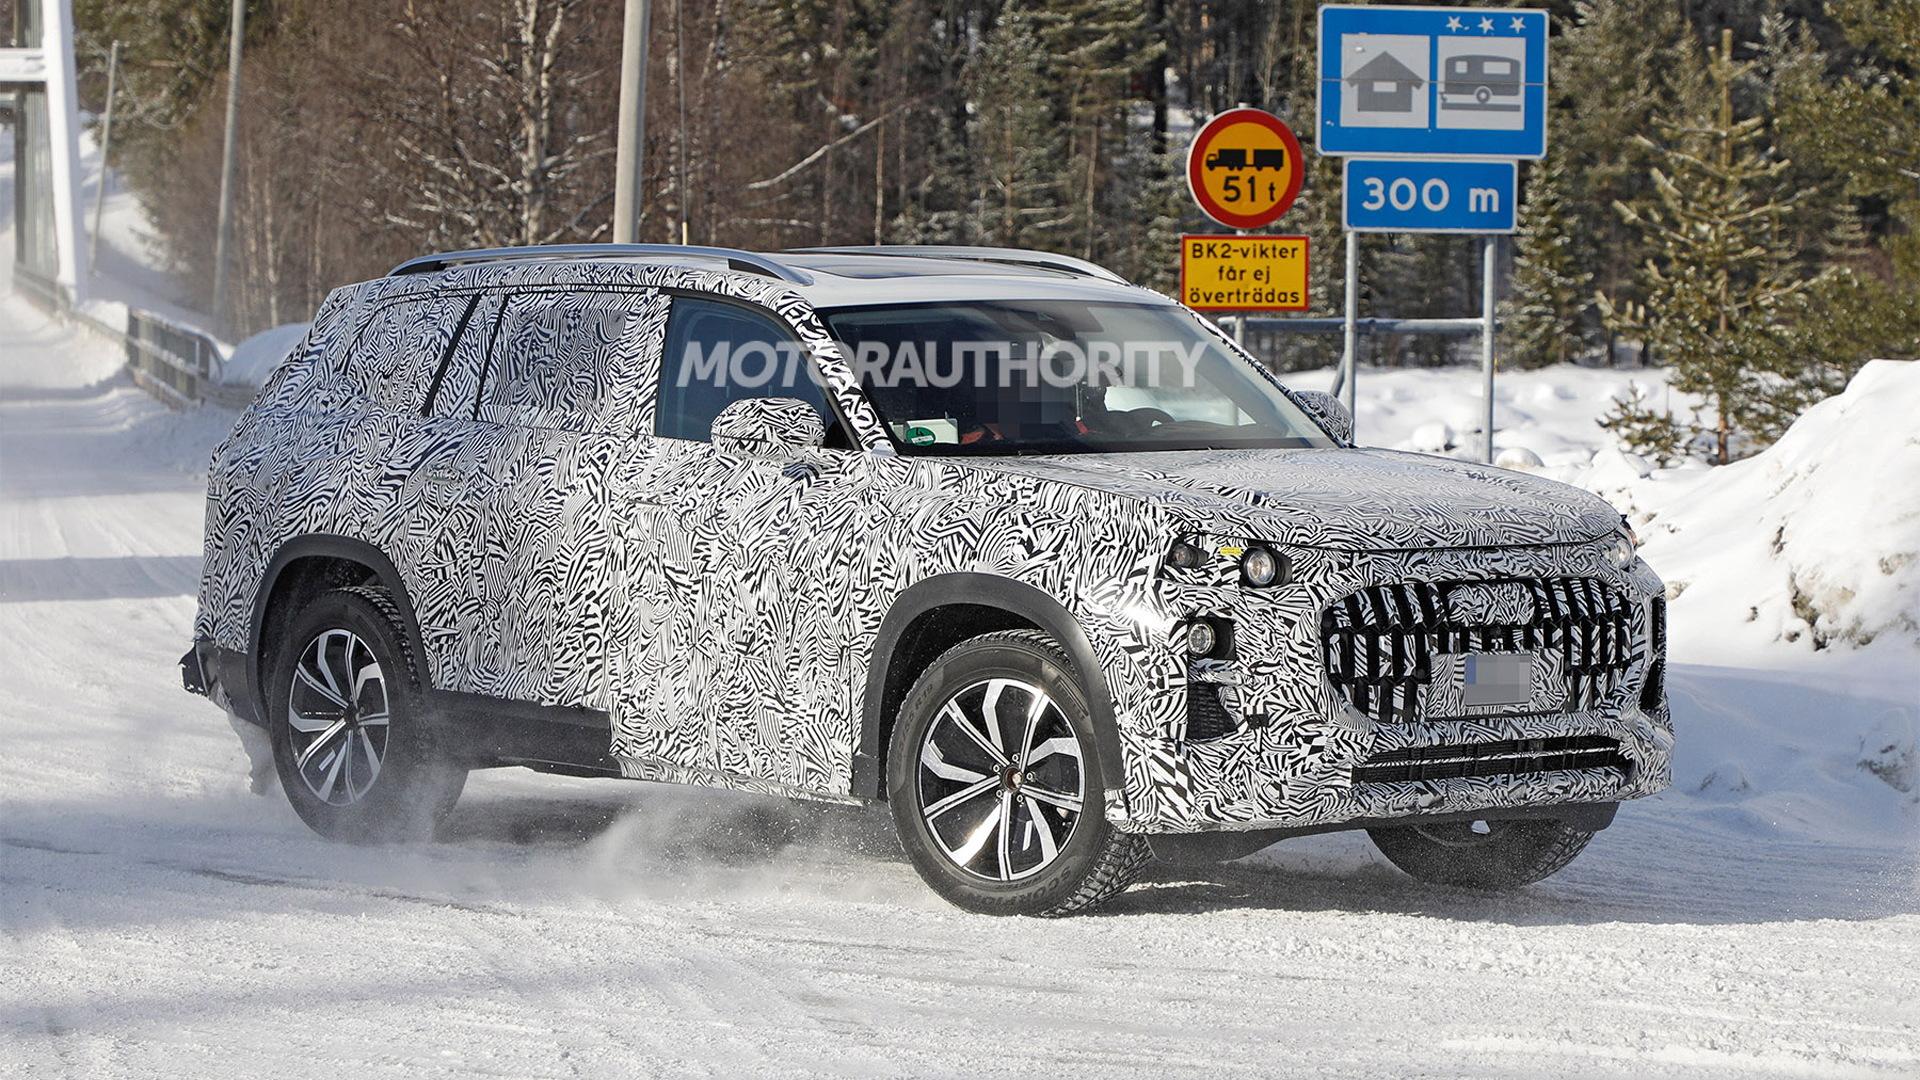 2023 Audi Q9 test mule spy shots - Photo credit:S. Baldauf/SB-Medien